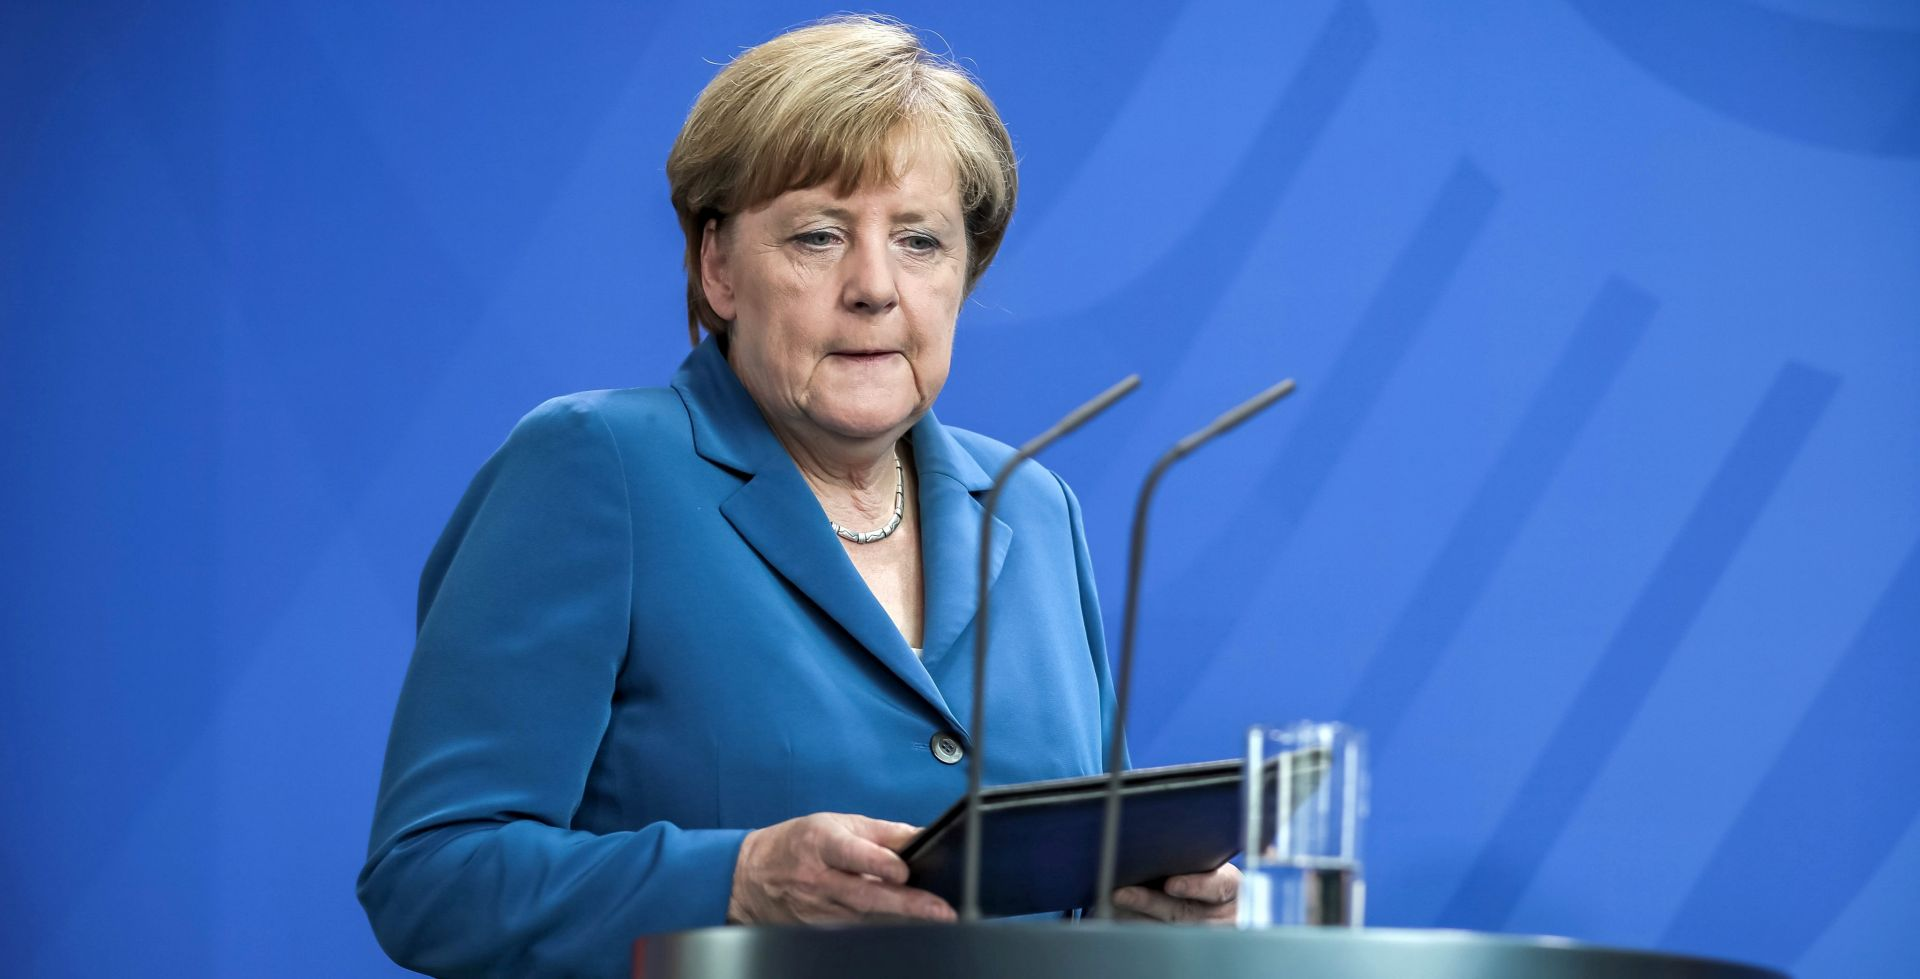 Mekel odbila mijenjati politiku o izbjeglicama, predložila nove mjere